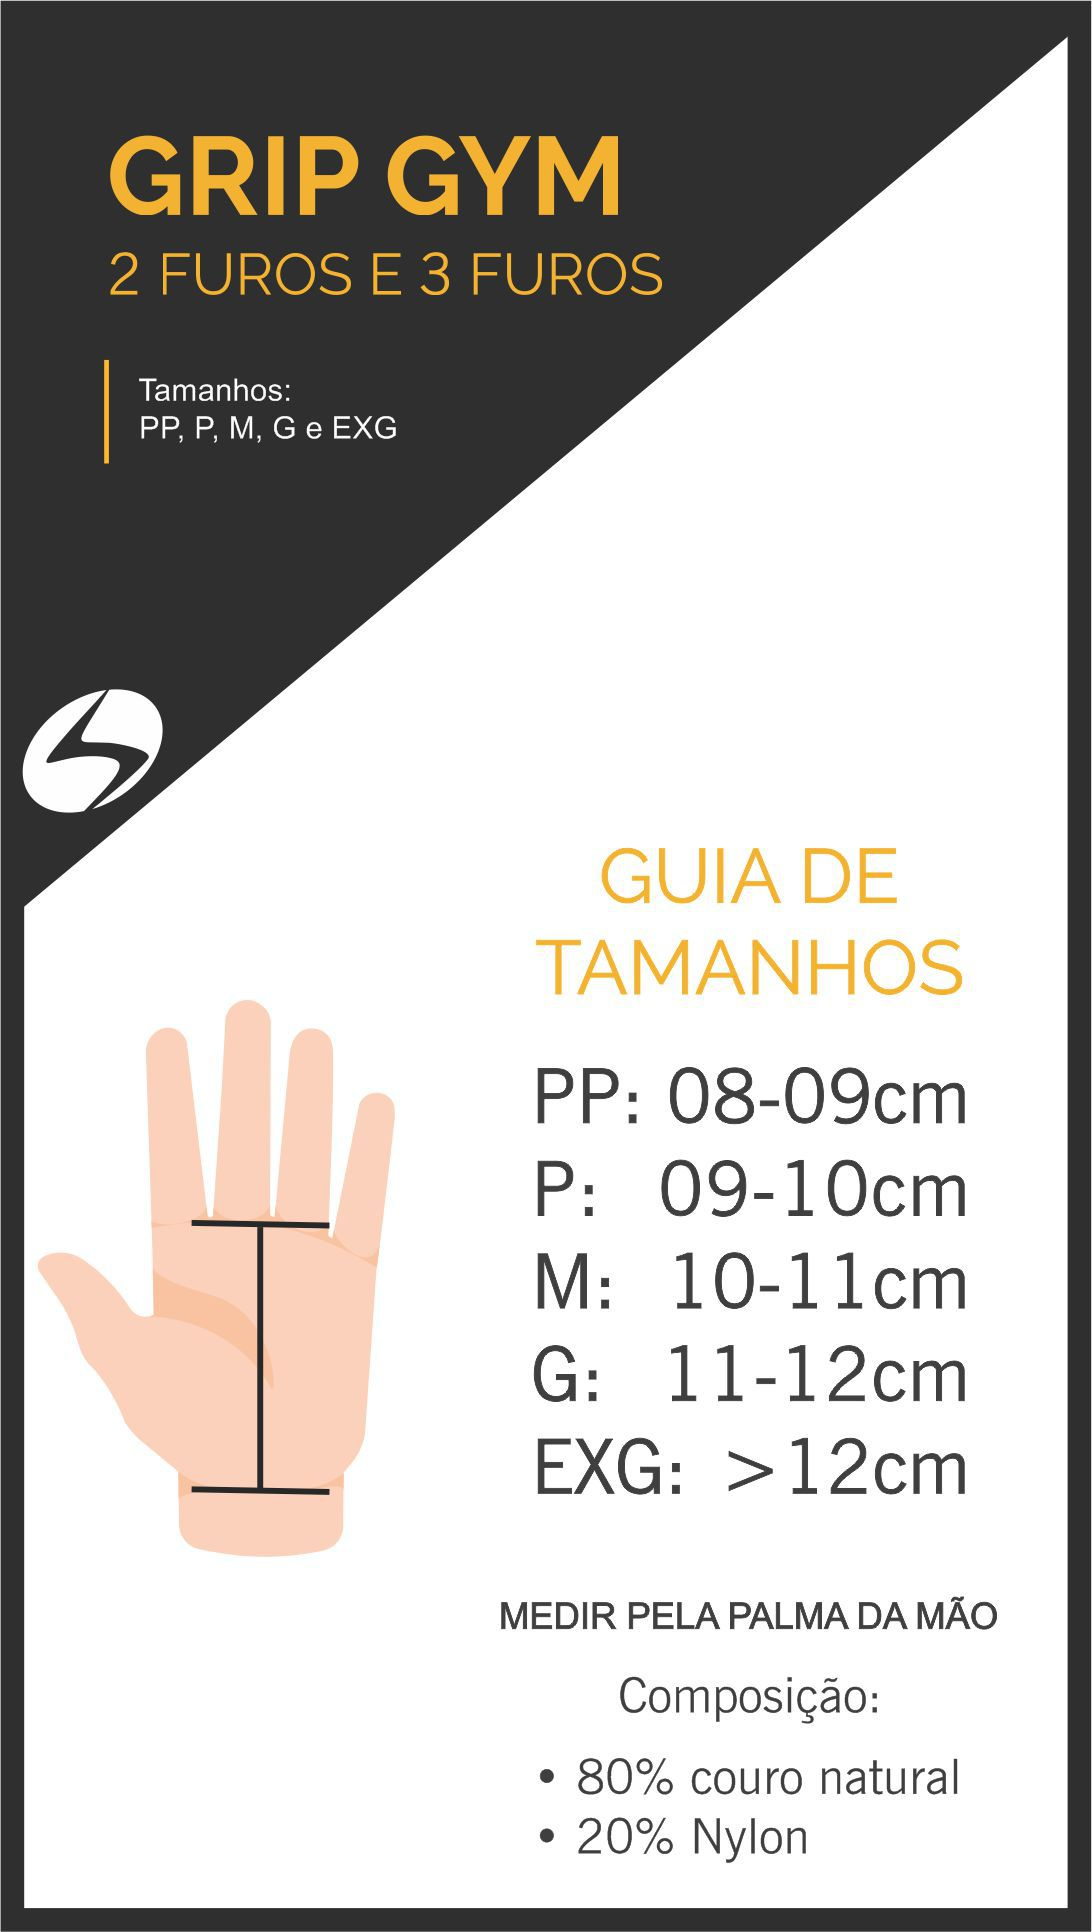 Grip Gym Export 3.0 - Hand Grip - Crossfit - Café